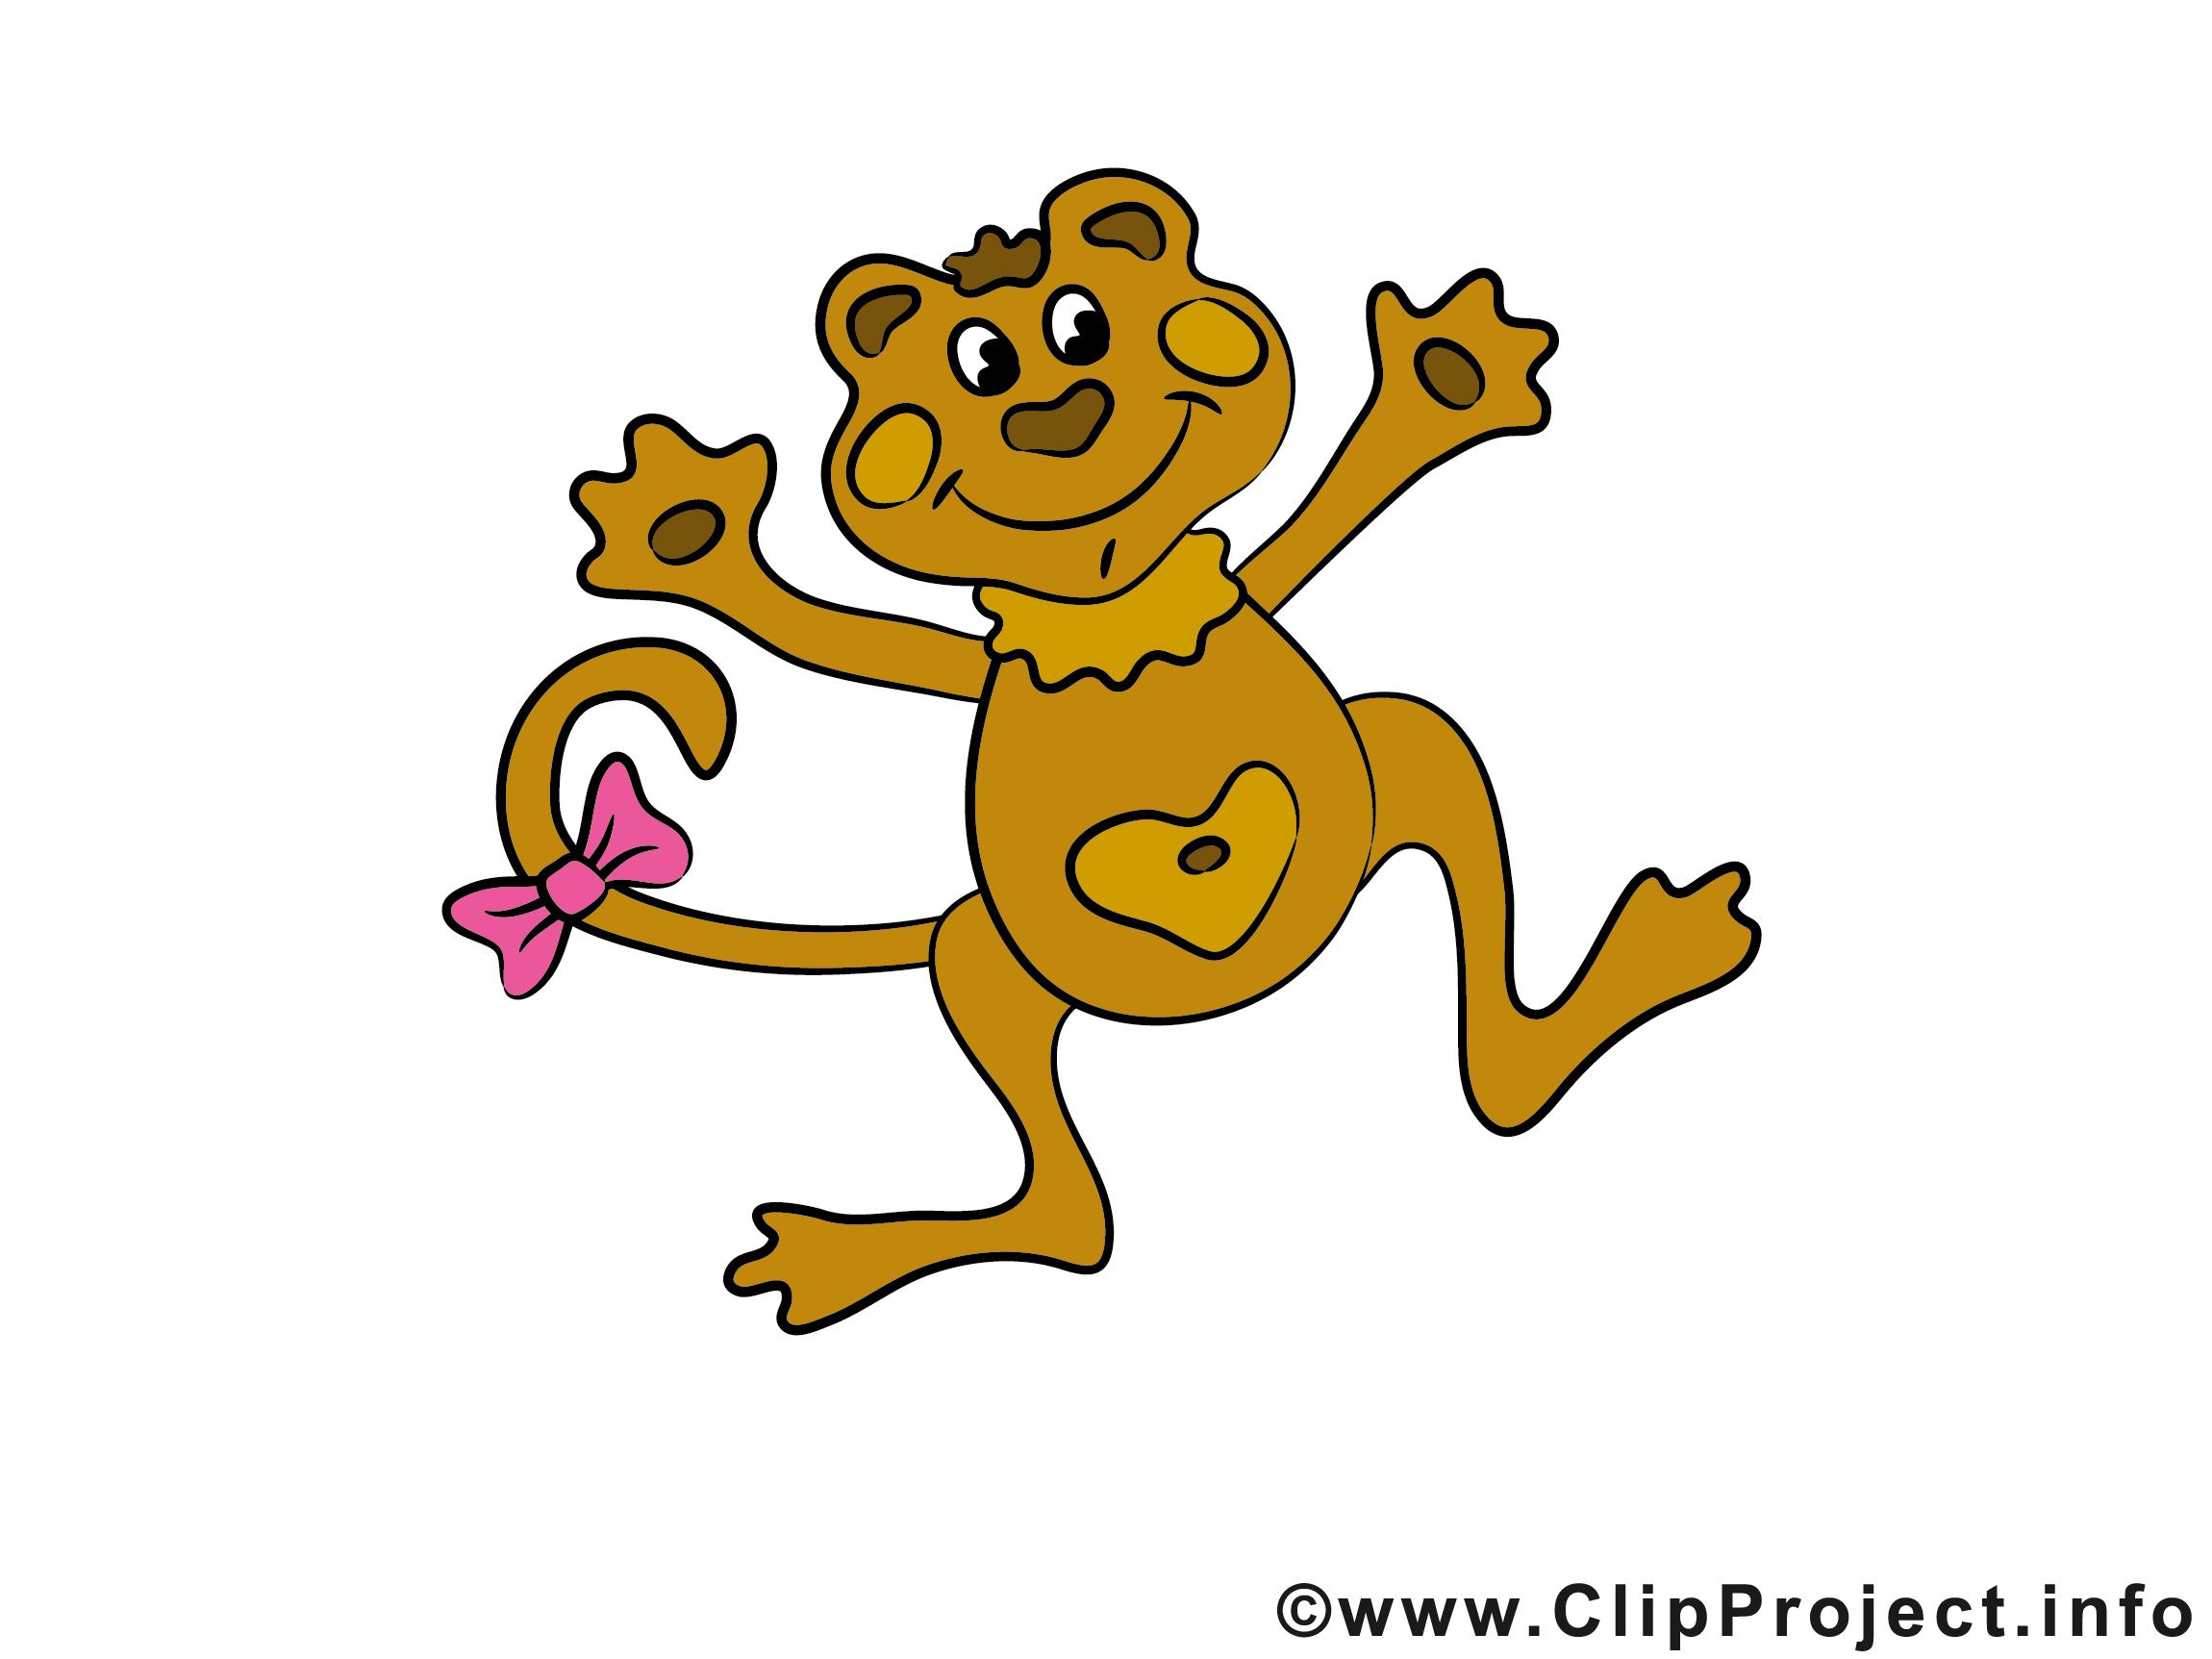 Affe clipart kostenlos royalty free stock Tiere Bilder, Cliparts, Cartoons, Grafiken, Illustrationen, Gifs ... royalty free stock